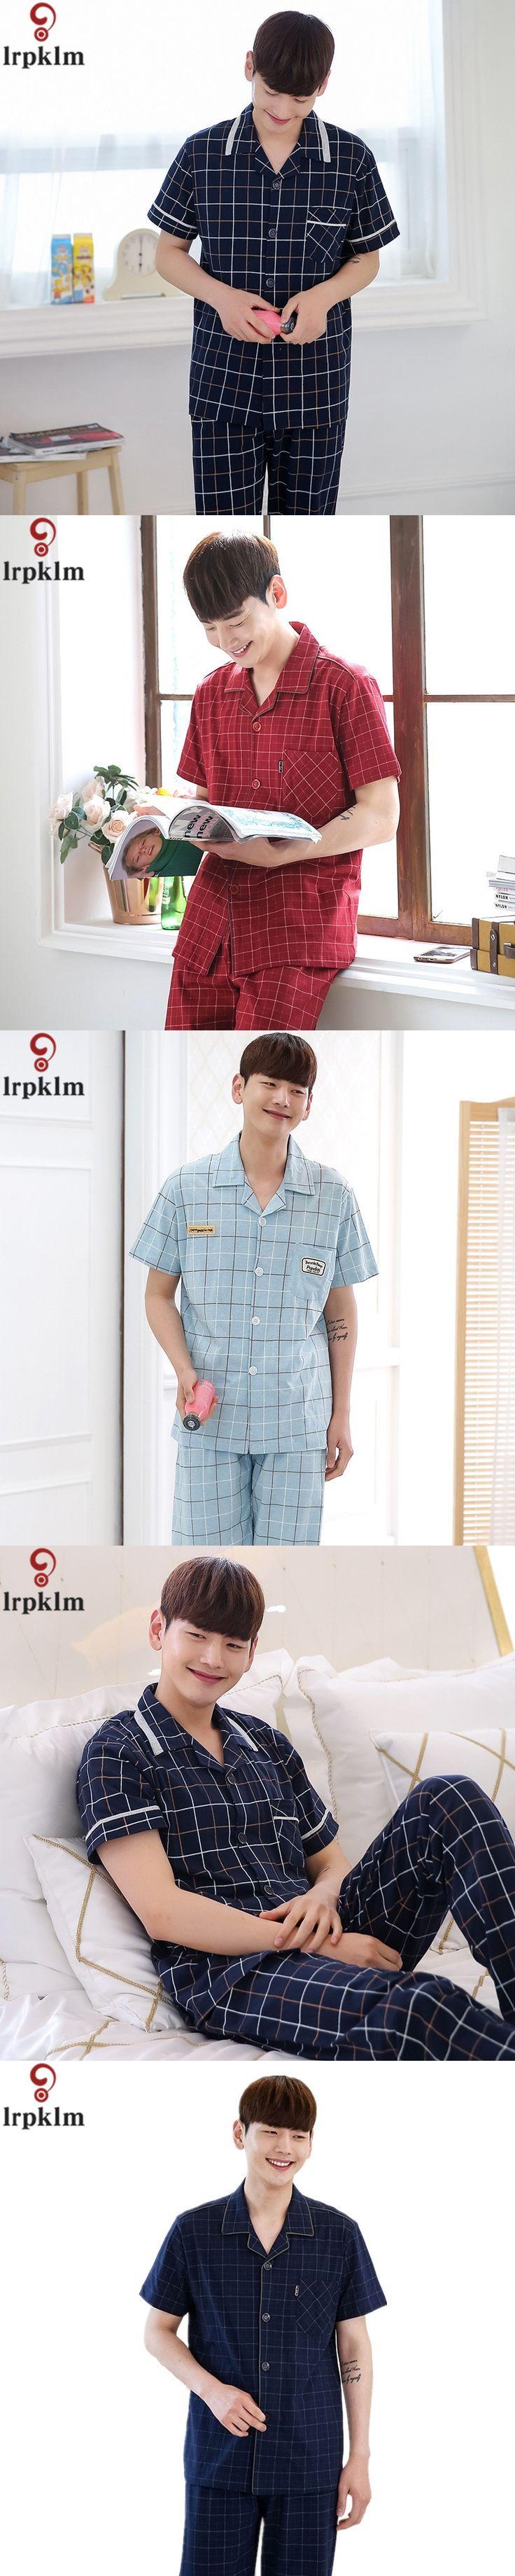 NEW Man's Sleepwear Cotton Pajamas Set Short Sleeve Pyjamas Trousers Men Lounge Sleep Pajama Set Plus size XXXL SY672